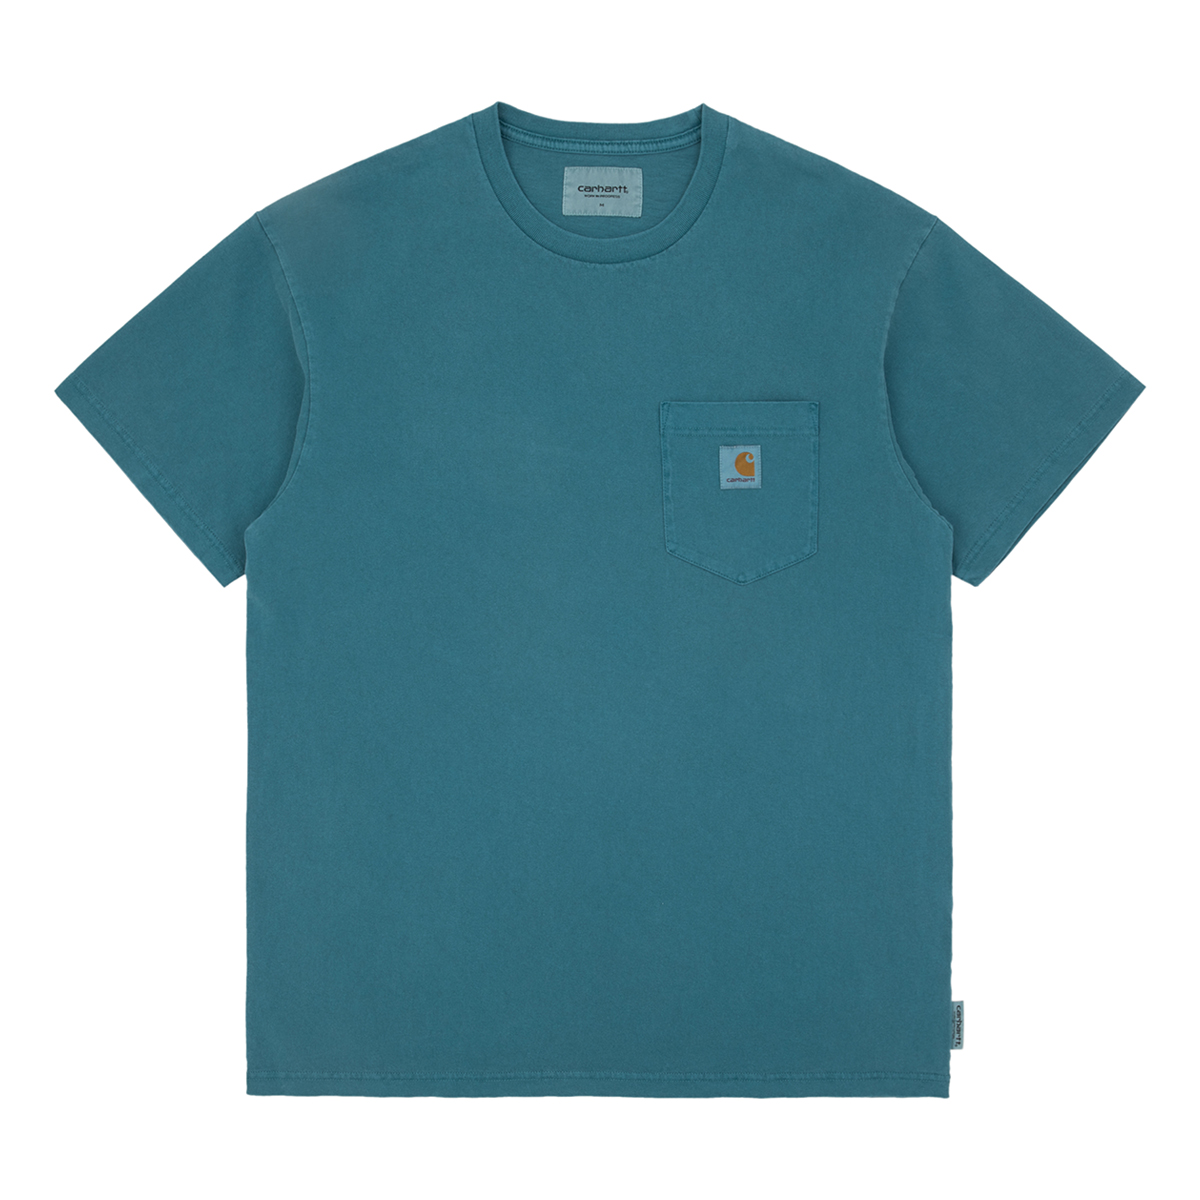 S/S Pocket Loose T-shirt (PD)